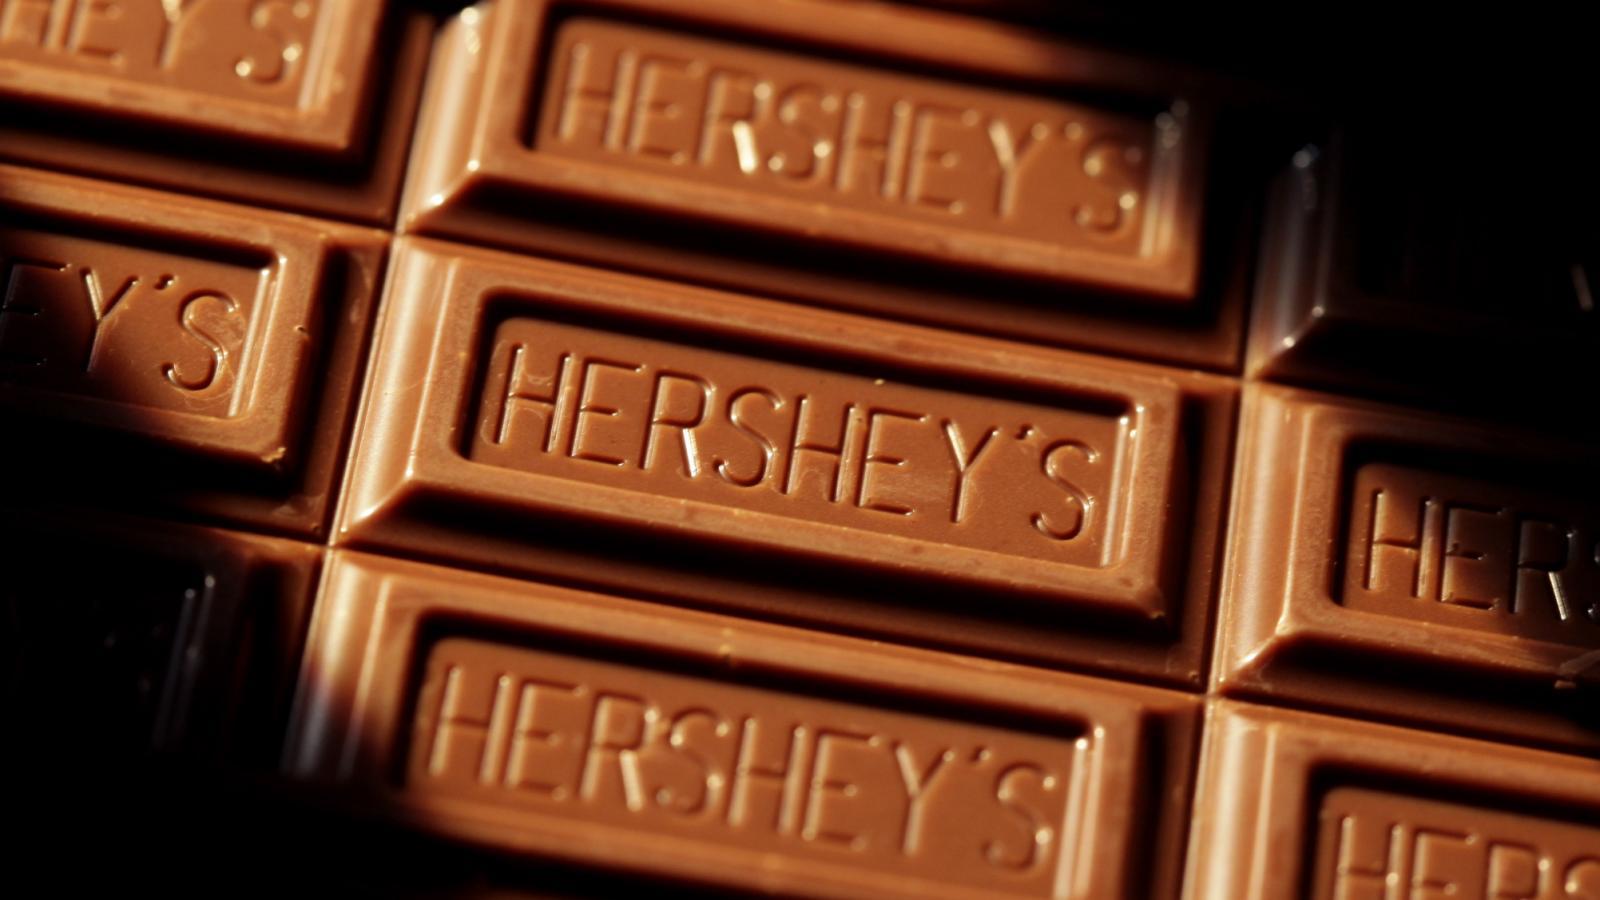 Hersheys Chocolate Computer Wallpaper 66288 1600x900px 1600x900